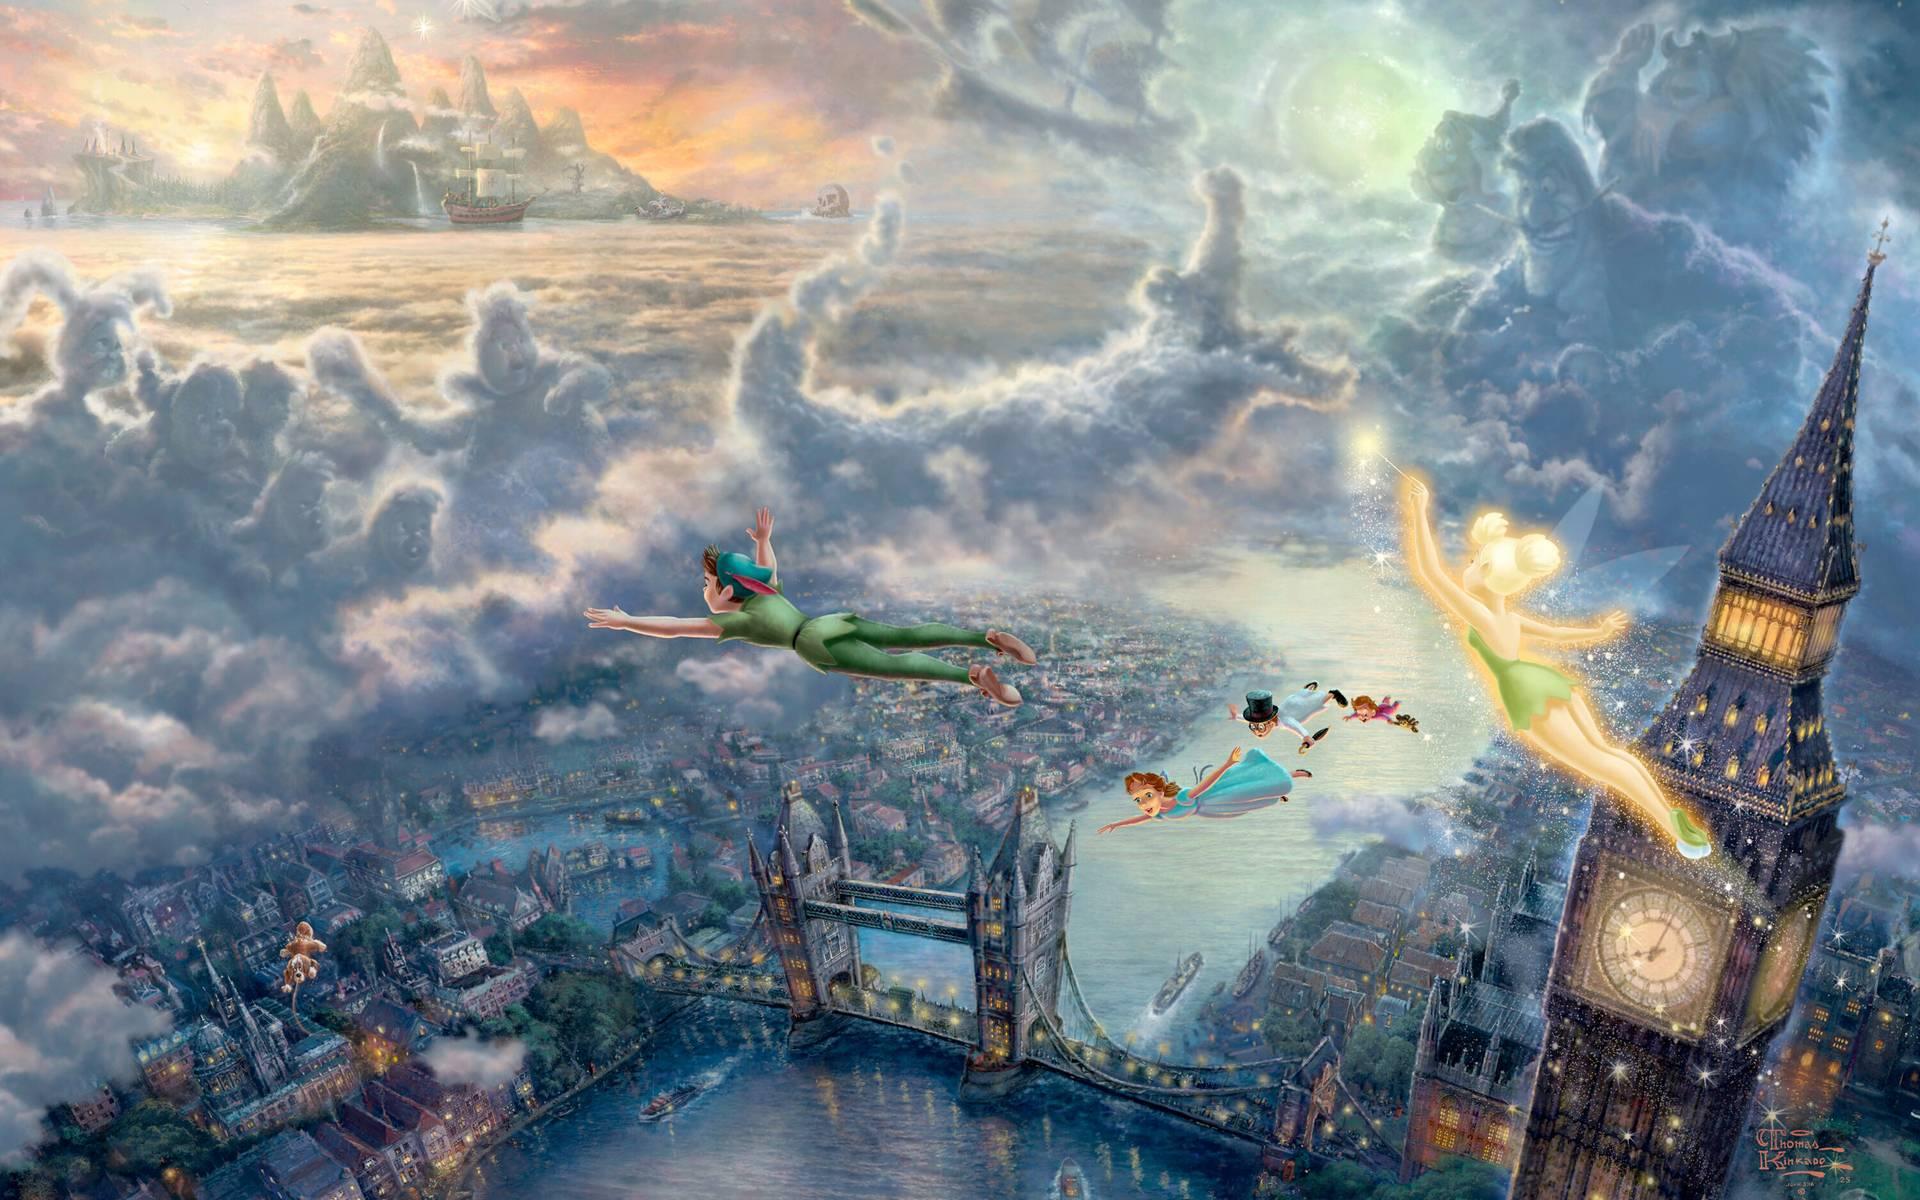 Cool Wallpaper Mac Disney - 5VpWFXv  2018_74657.jpg